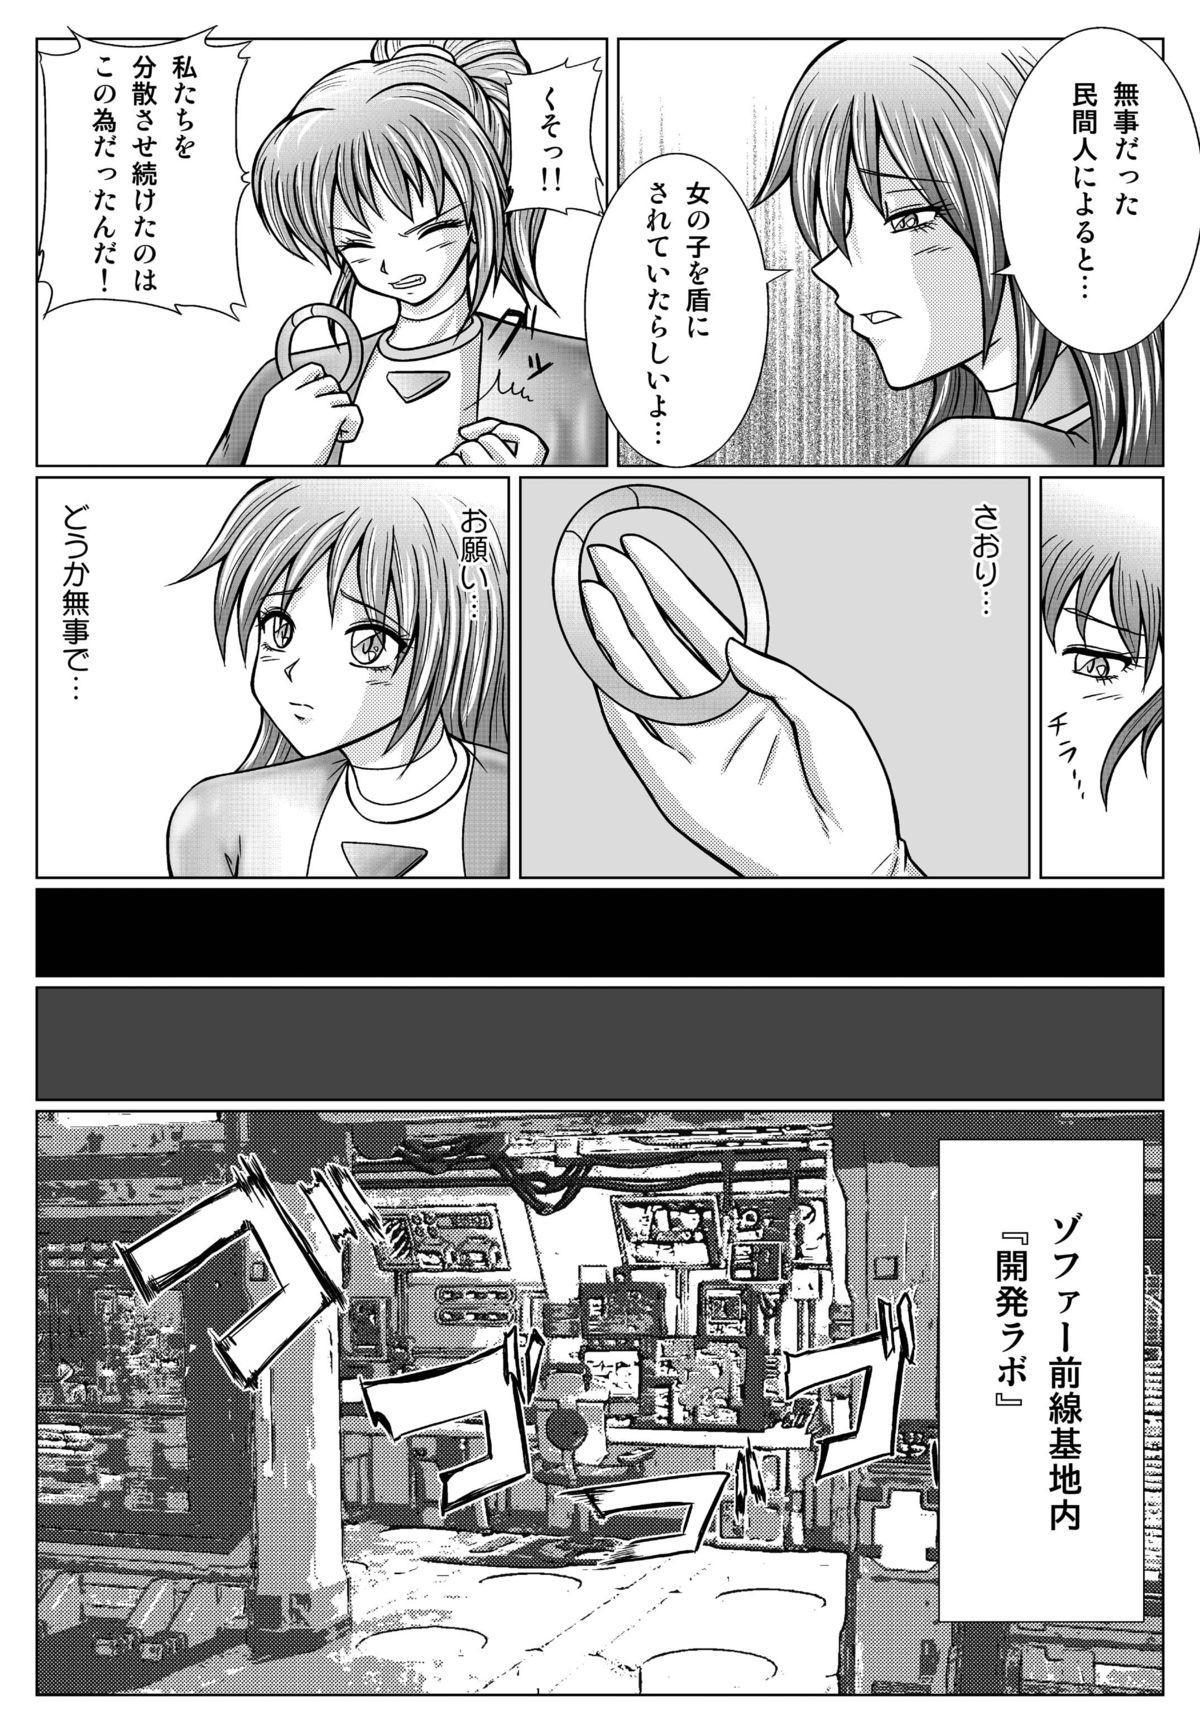 [Macxe's (monmon)] Tokubousentai Dinaranger ~Heroine Kairaku Sennou Keikaku~ Vol.01/02/03 (Renkaban) [Digital] 47